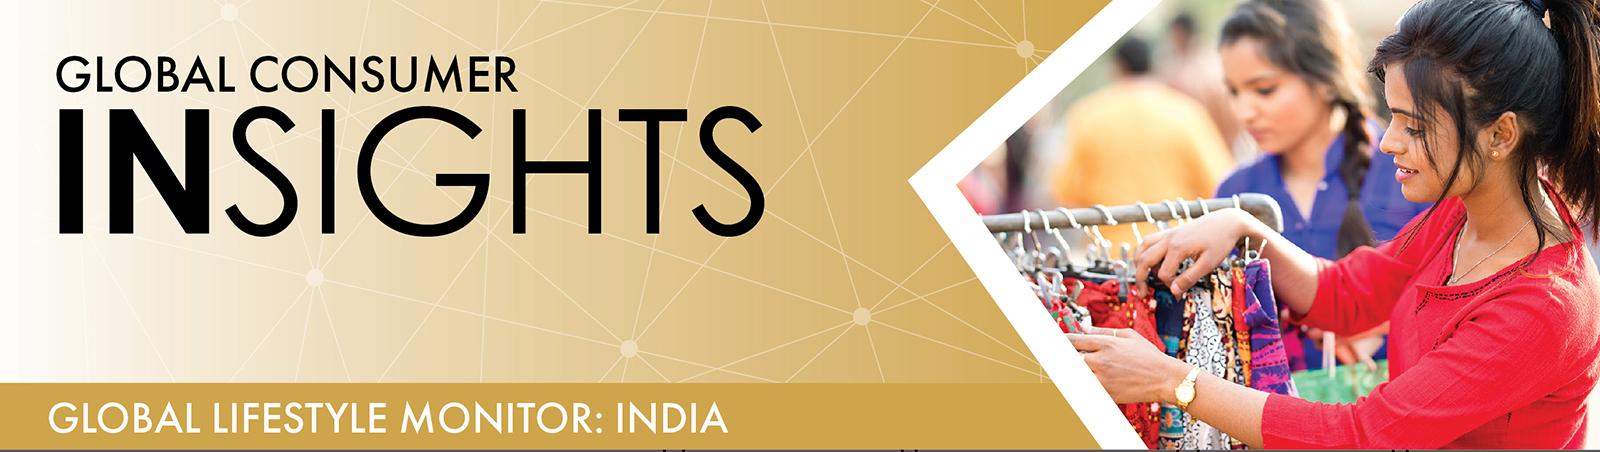 Global Lifestyle Monitor: India